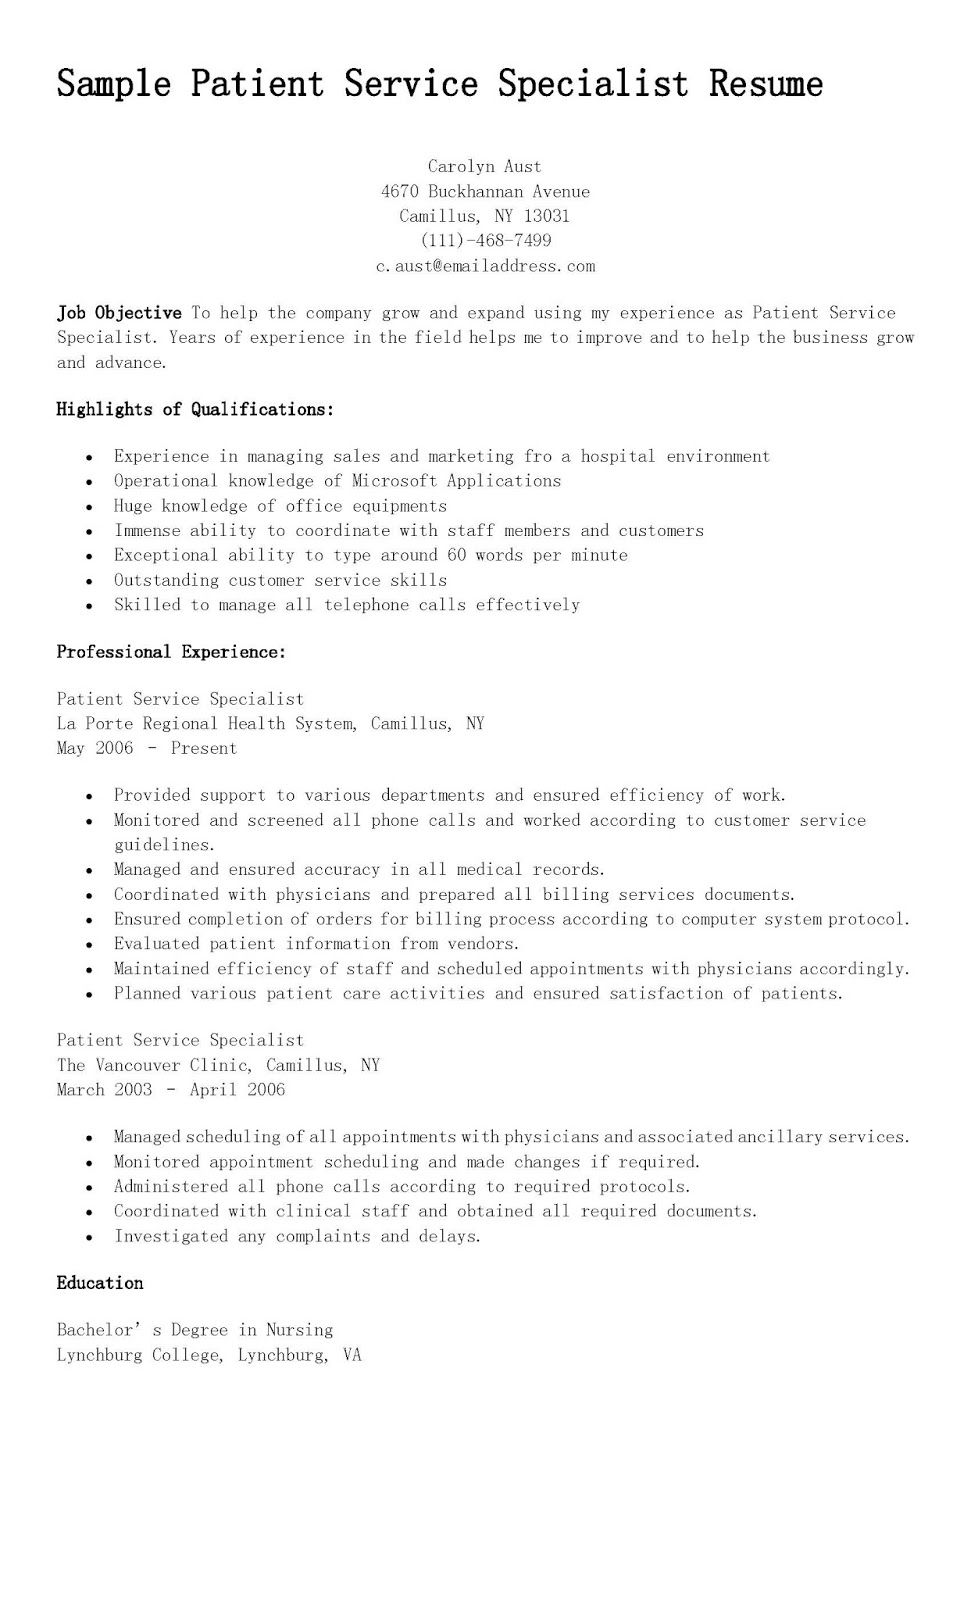 Sample Patient Service Specialist Resume Accounts Receivable